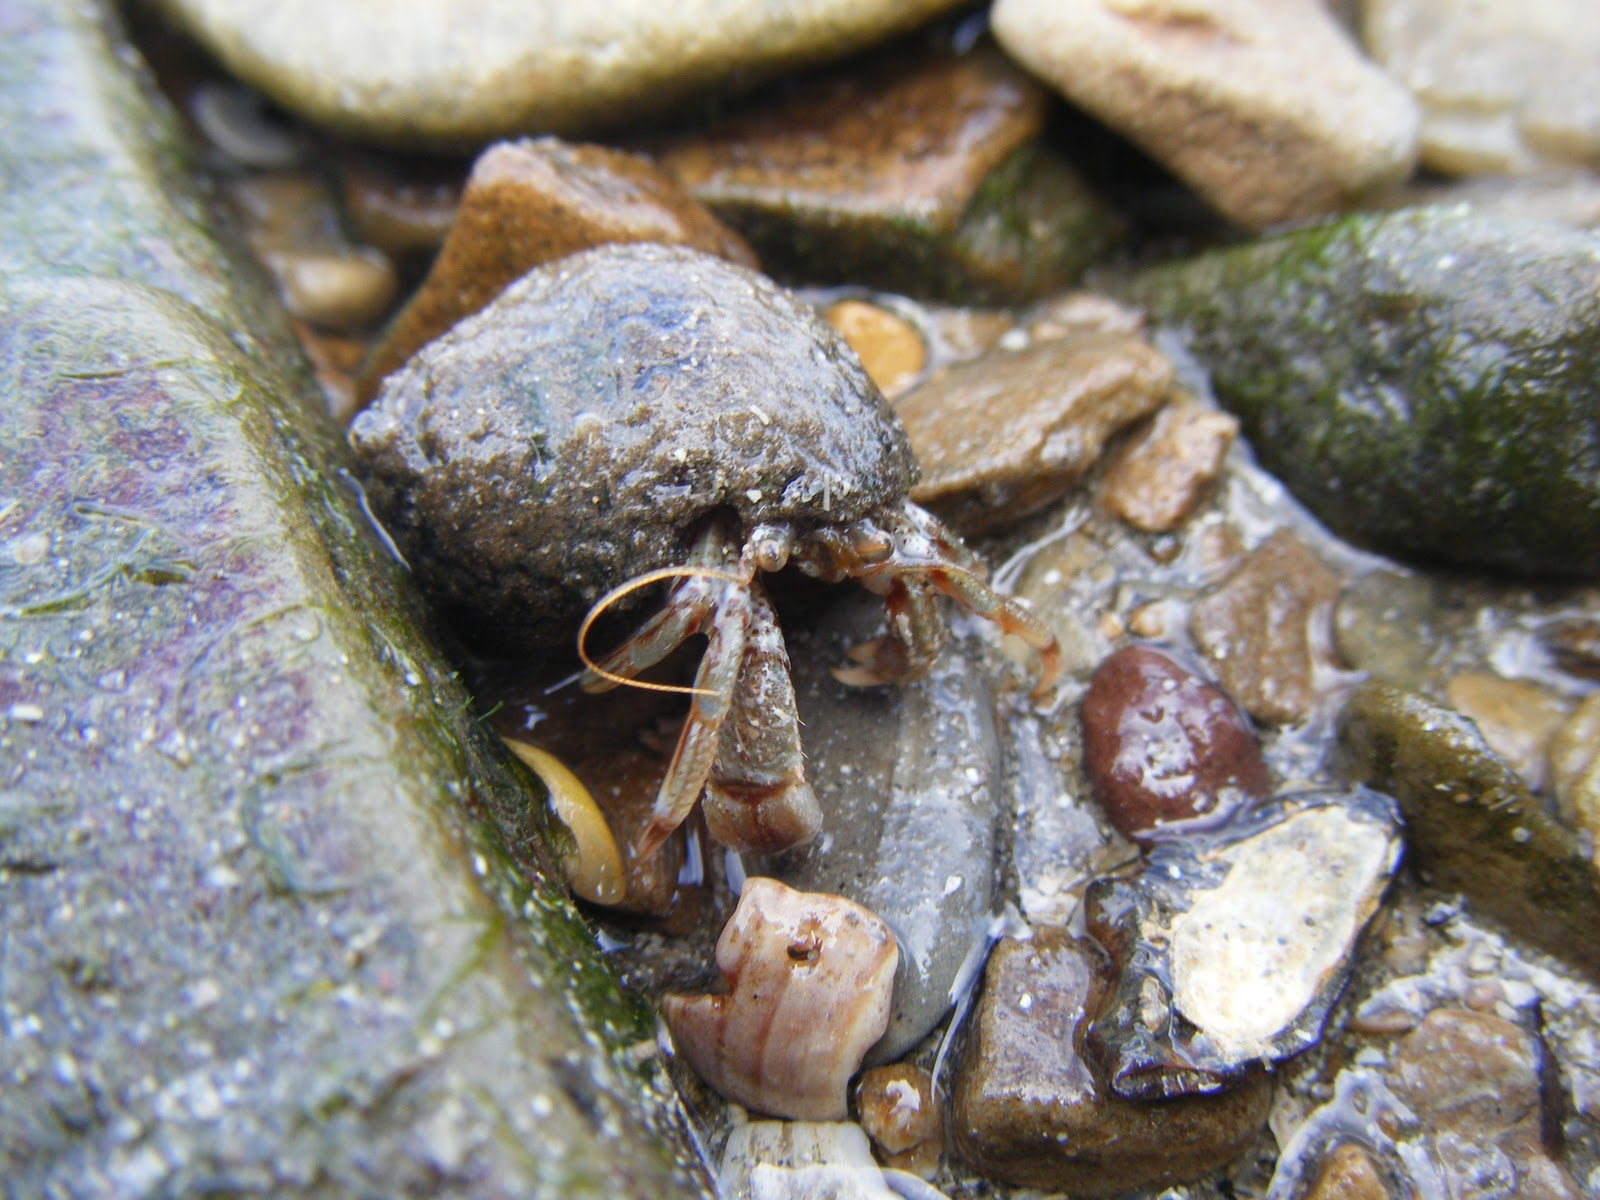 21stcenturynaturalist: Hermit Crabs Prefer Winkle Shells